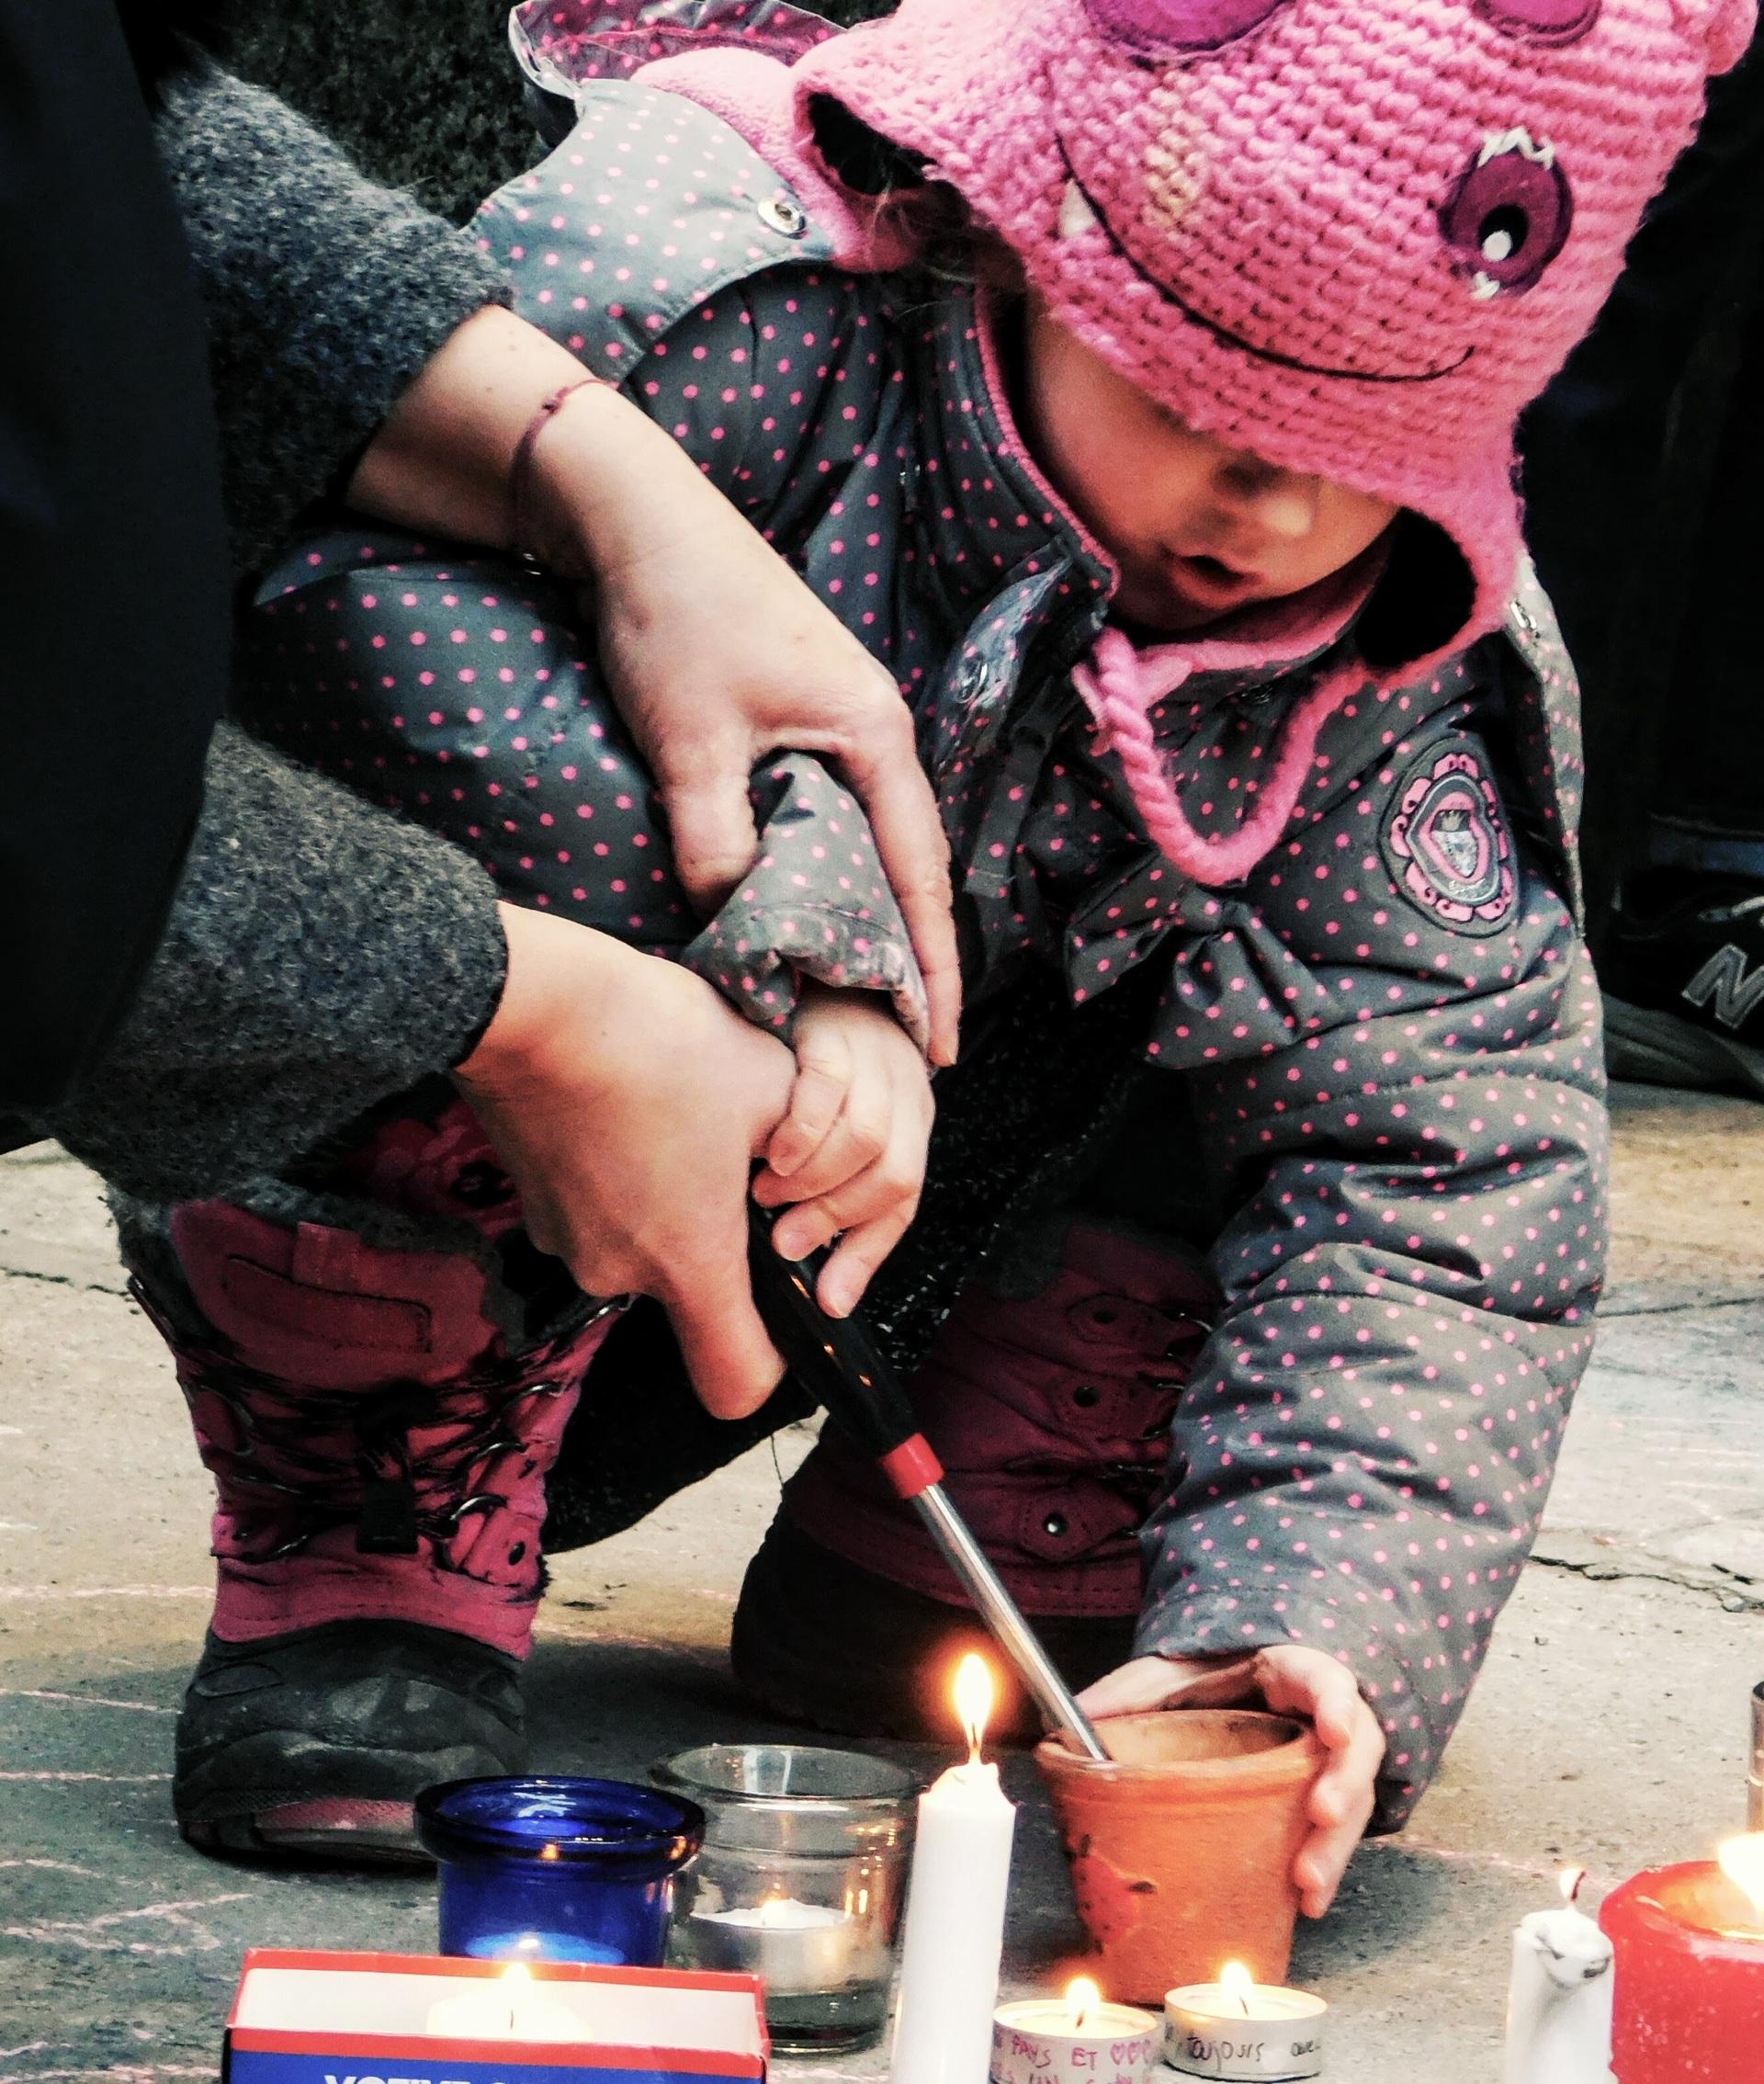 Kid lighting vigil candel | rick.cognyl.fournier, child, outdoors, people